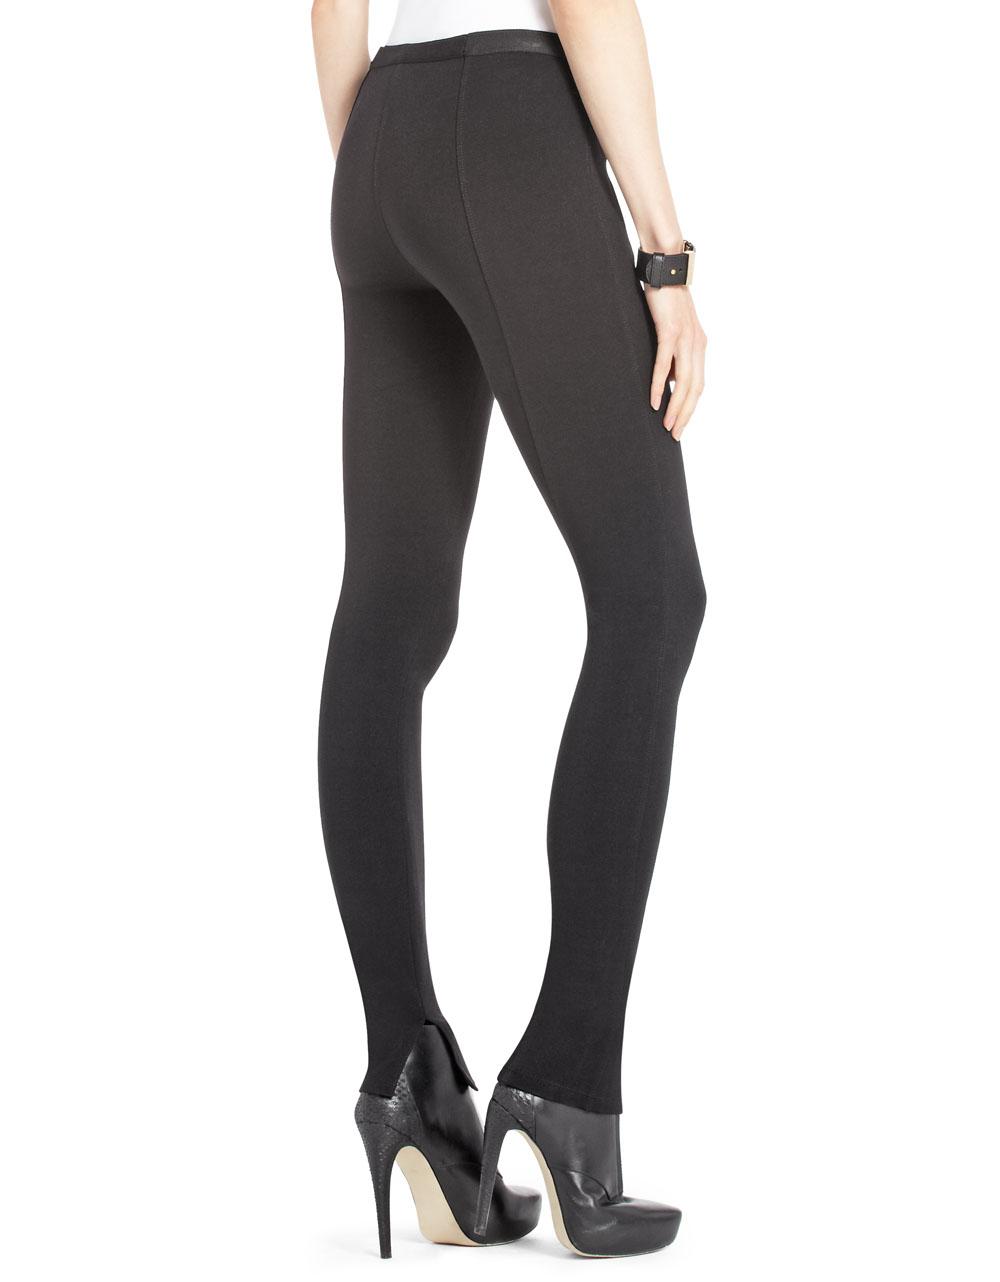 lyst - bcbgmaxazria sissy zipper pocket leggings in black